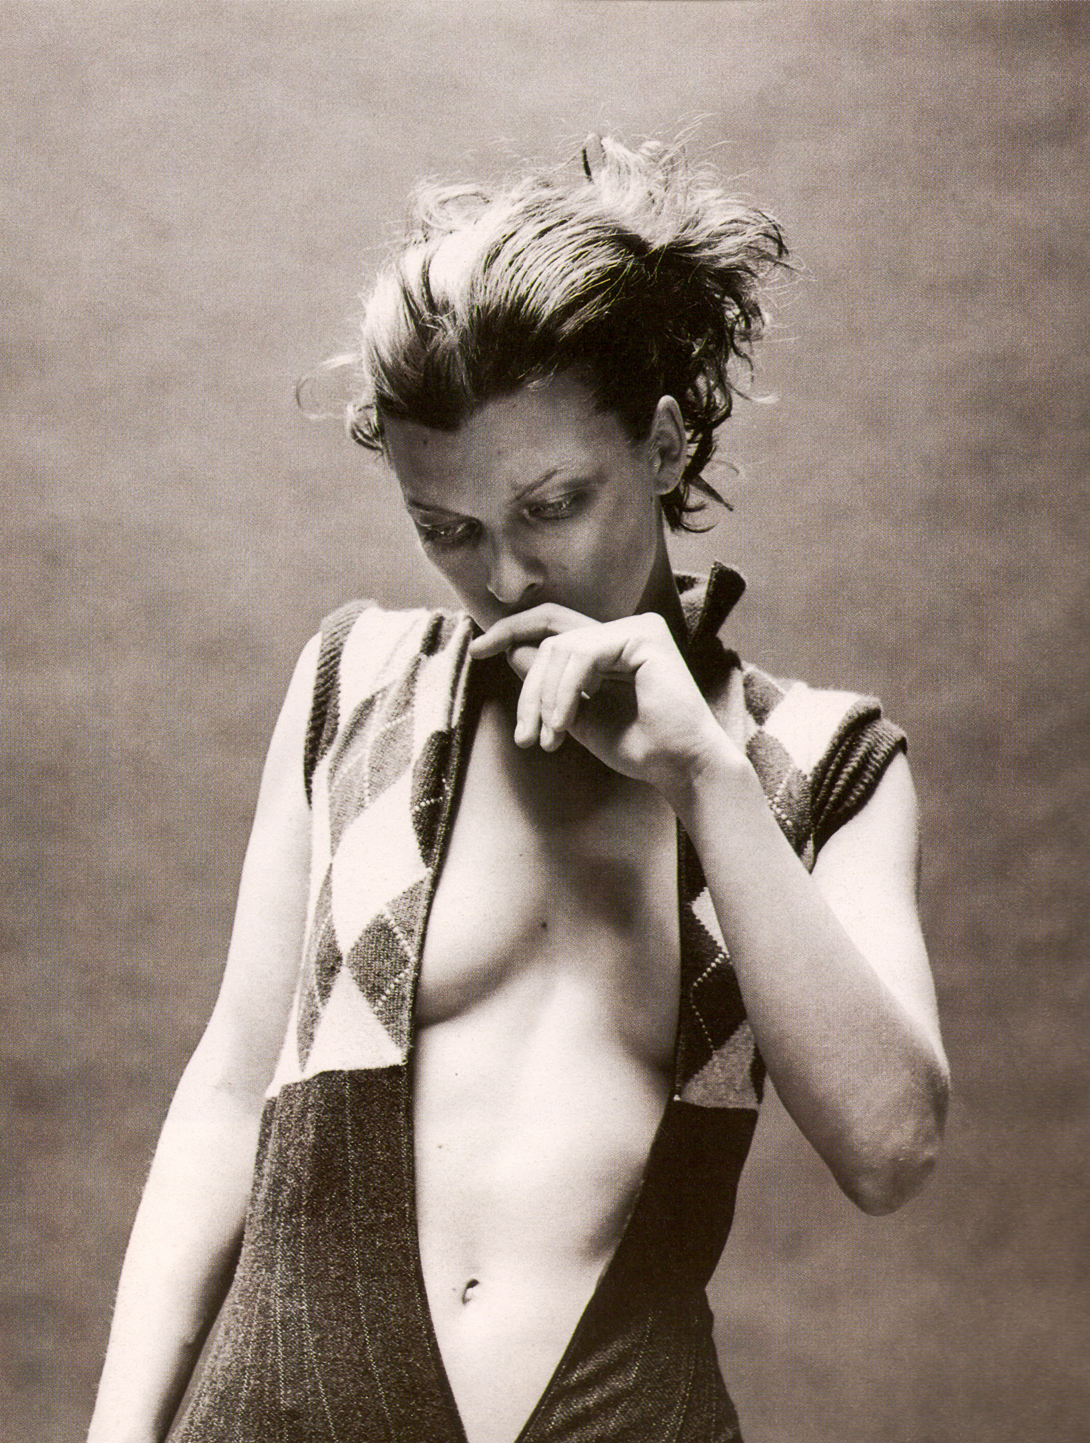 Milla_Jovovich-36-toooth.jpg